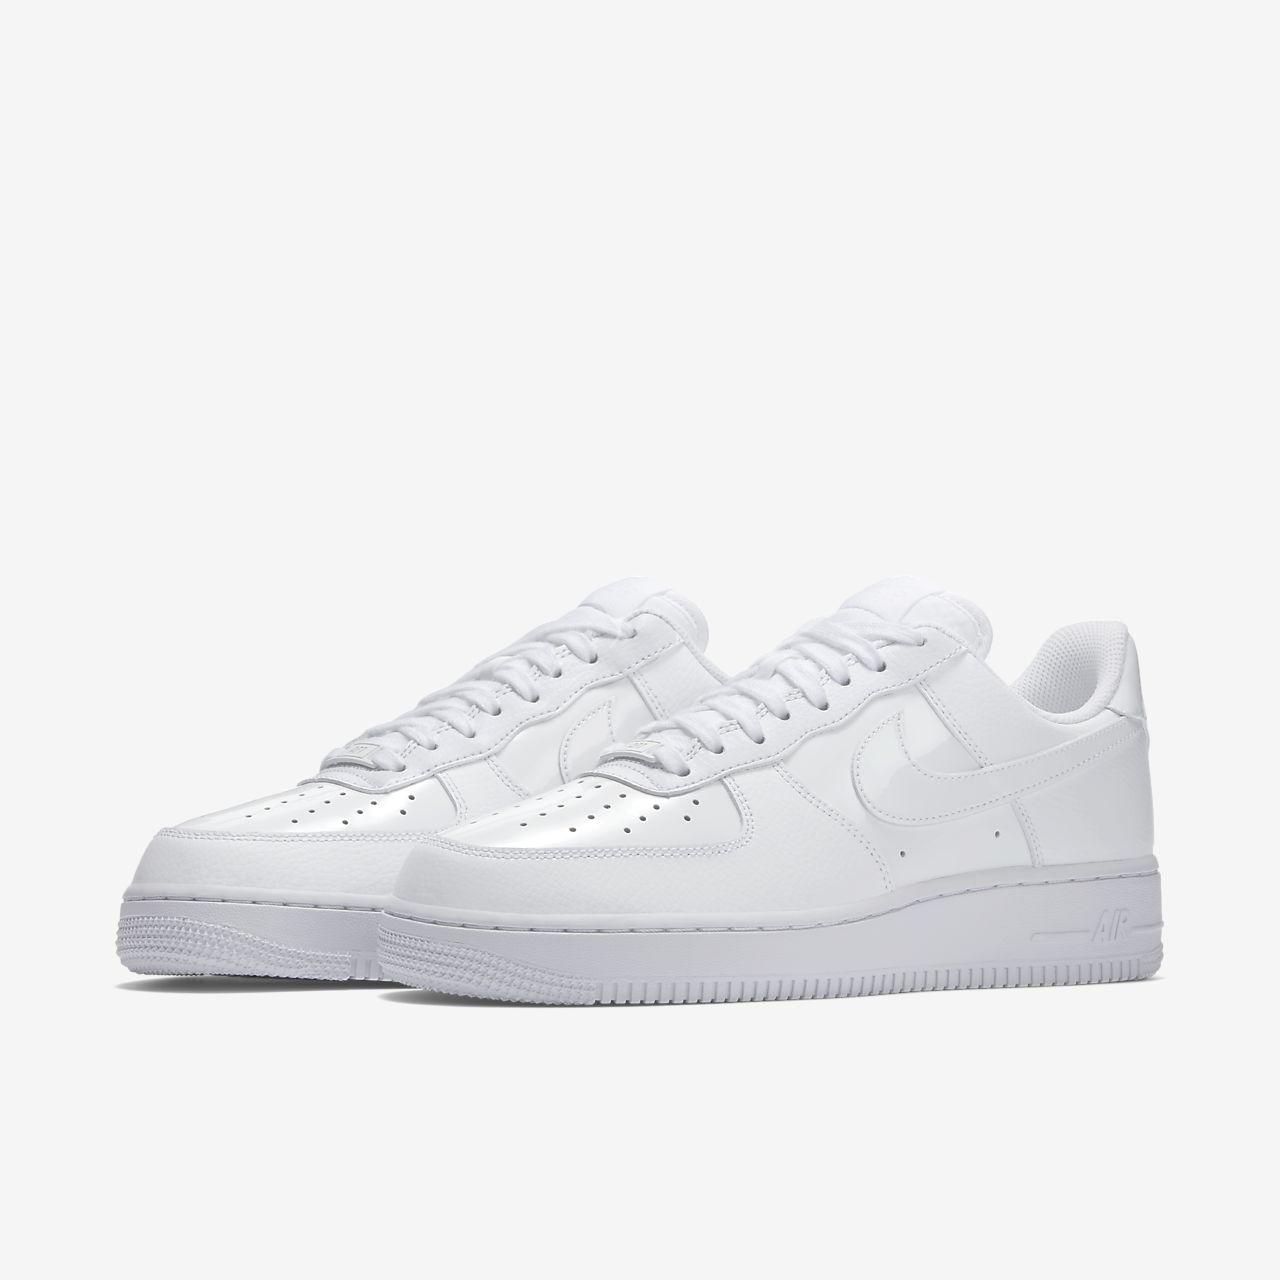 ... Nike Air Force 1 '07 Patent Women's Shoe